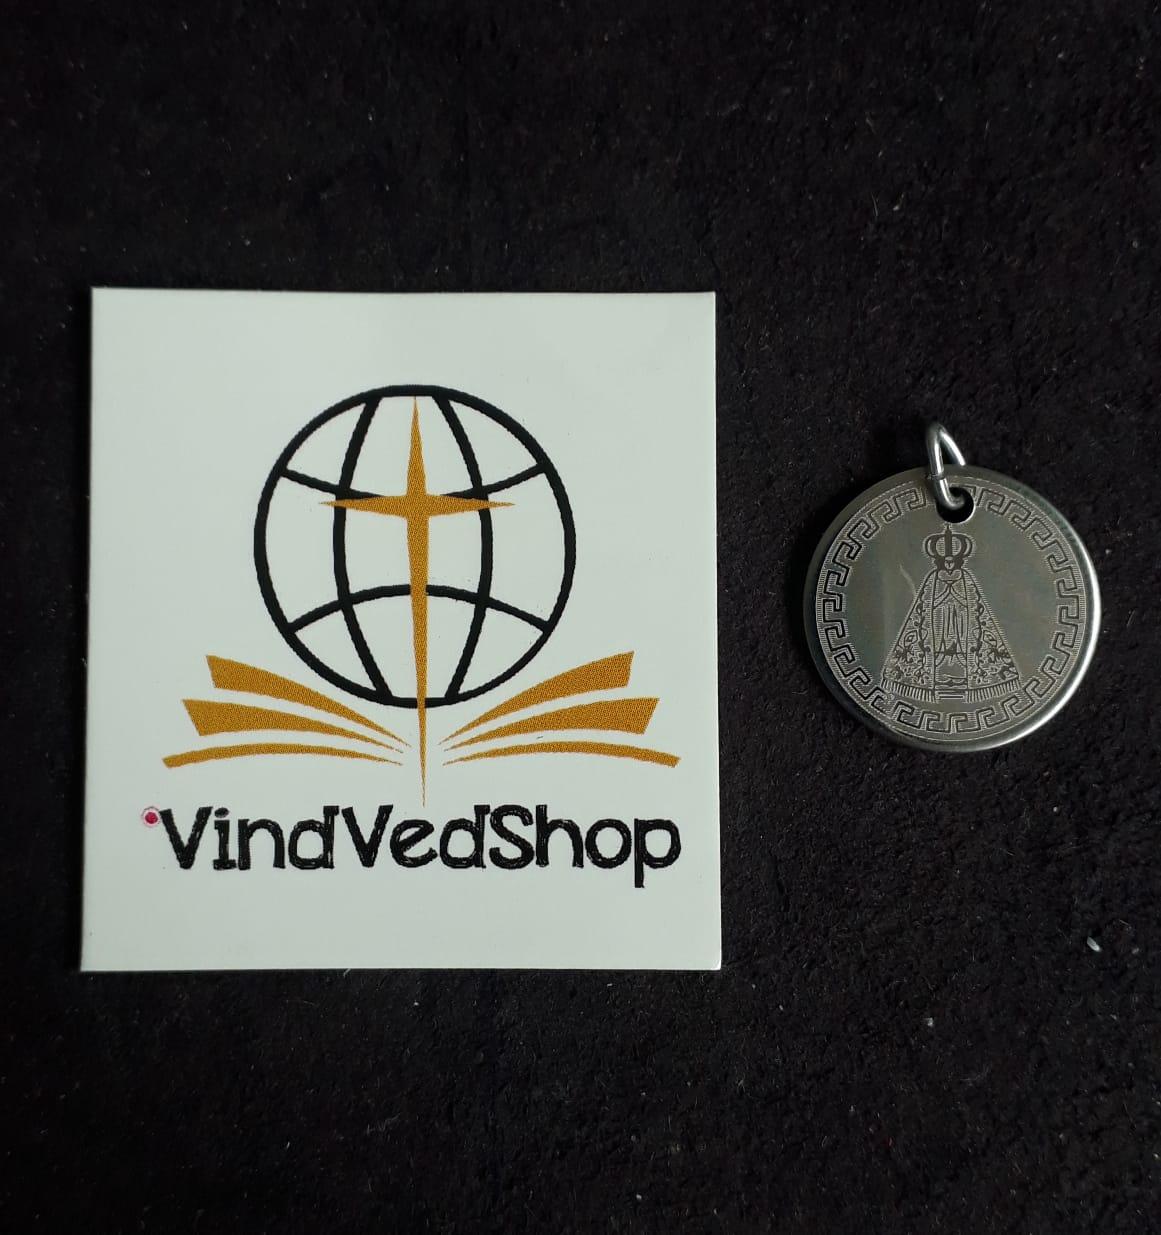 M75 - Medalha Nossa Senhora Aparecida 20mm Aço Laser  - VindVedShop - Distribuidora Catolica